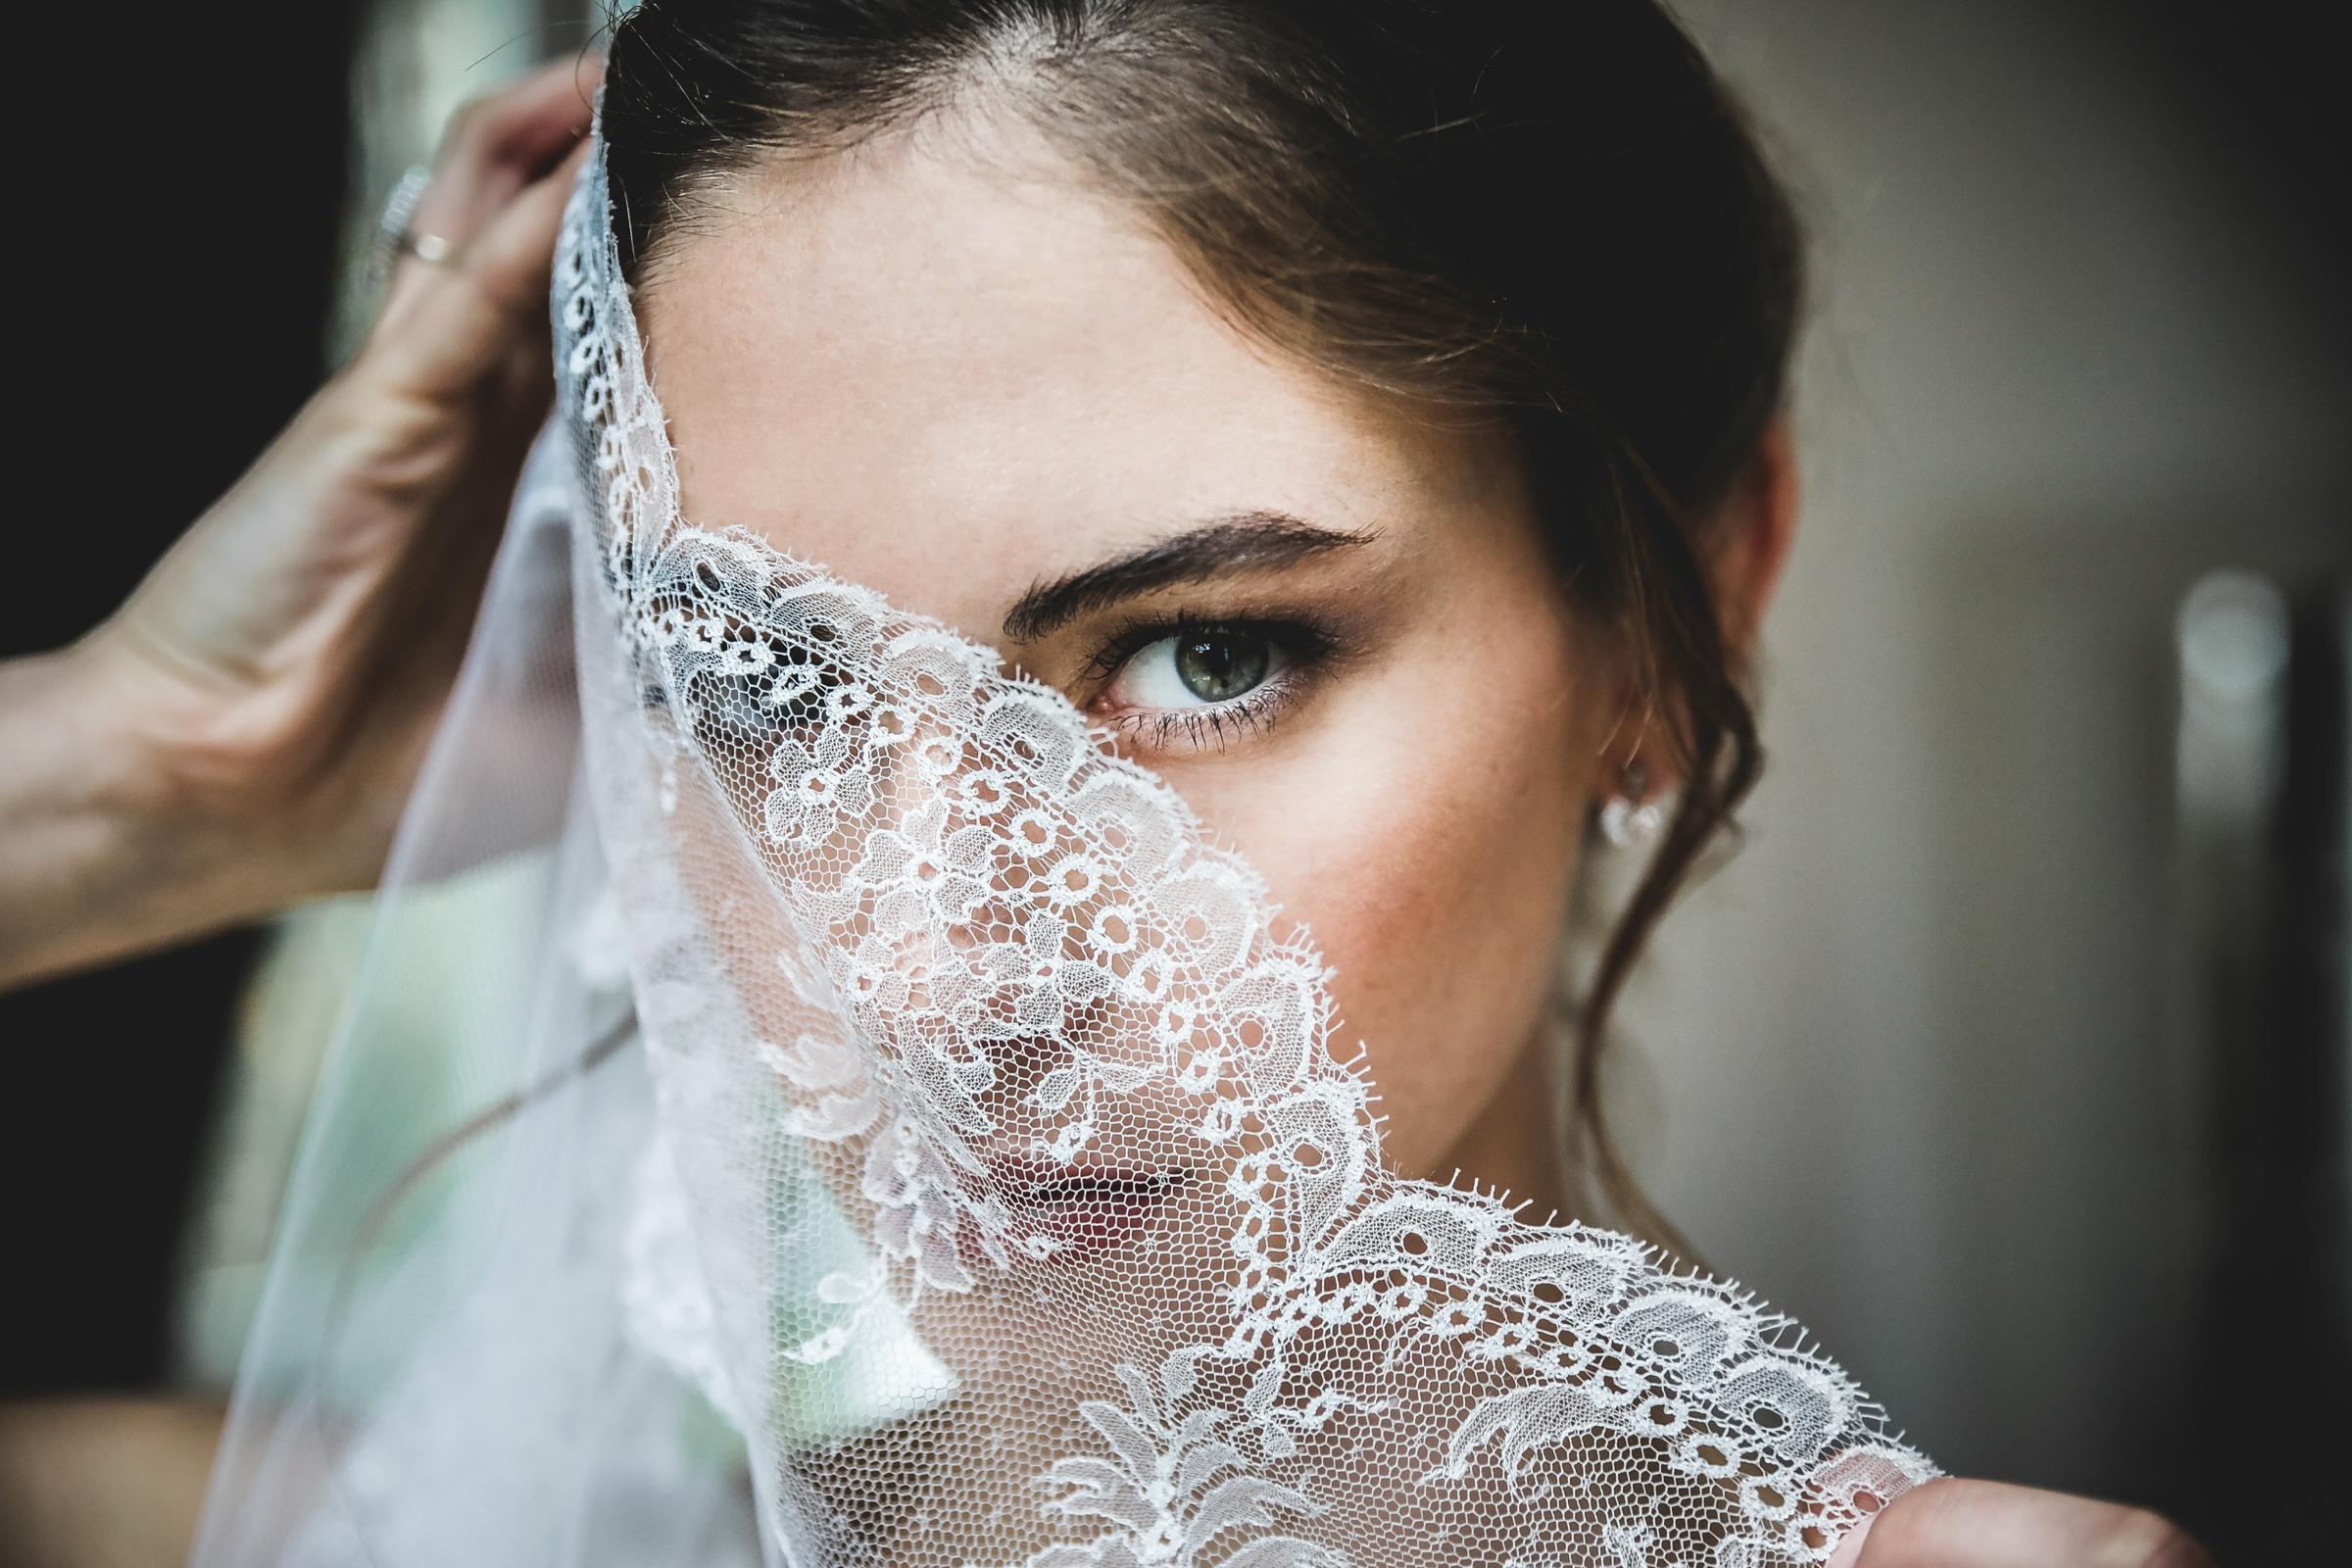 Bride peering through lace - photo by Julien Laurent-Georges